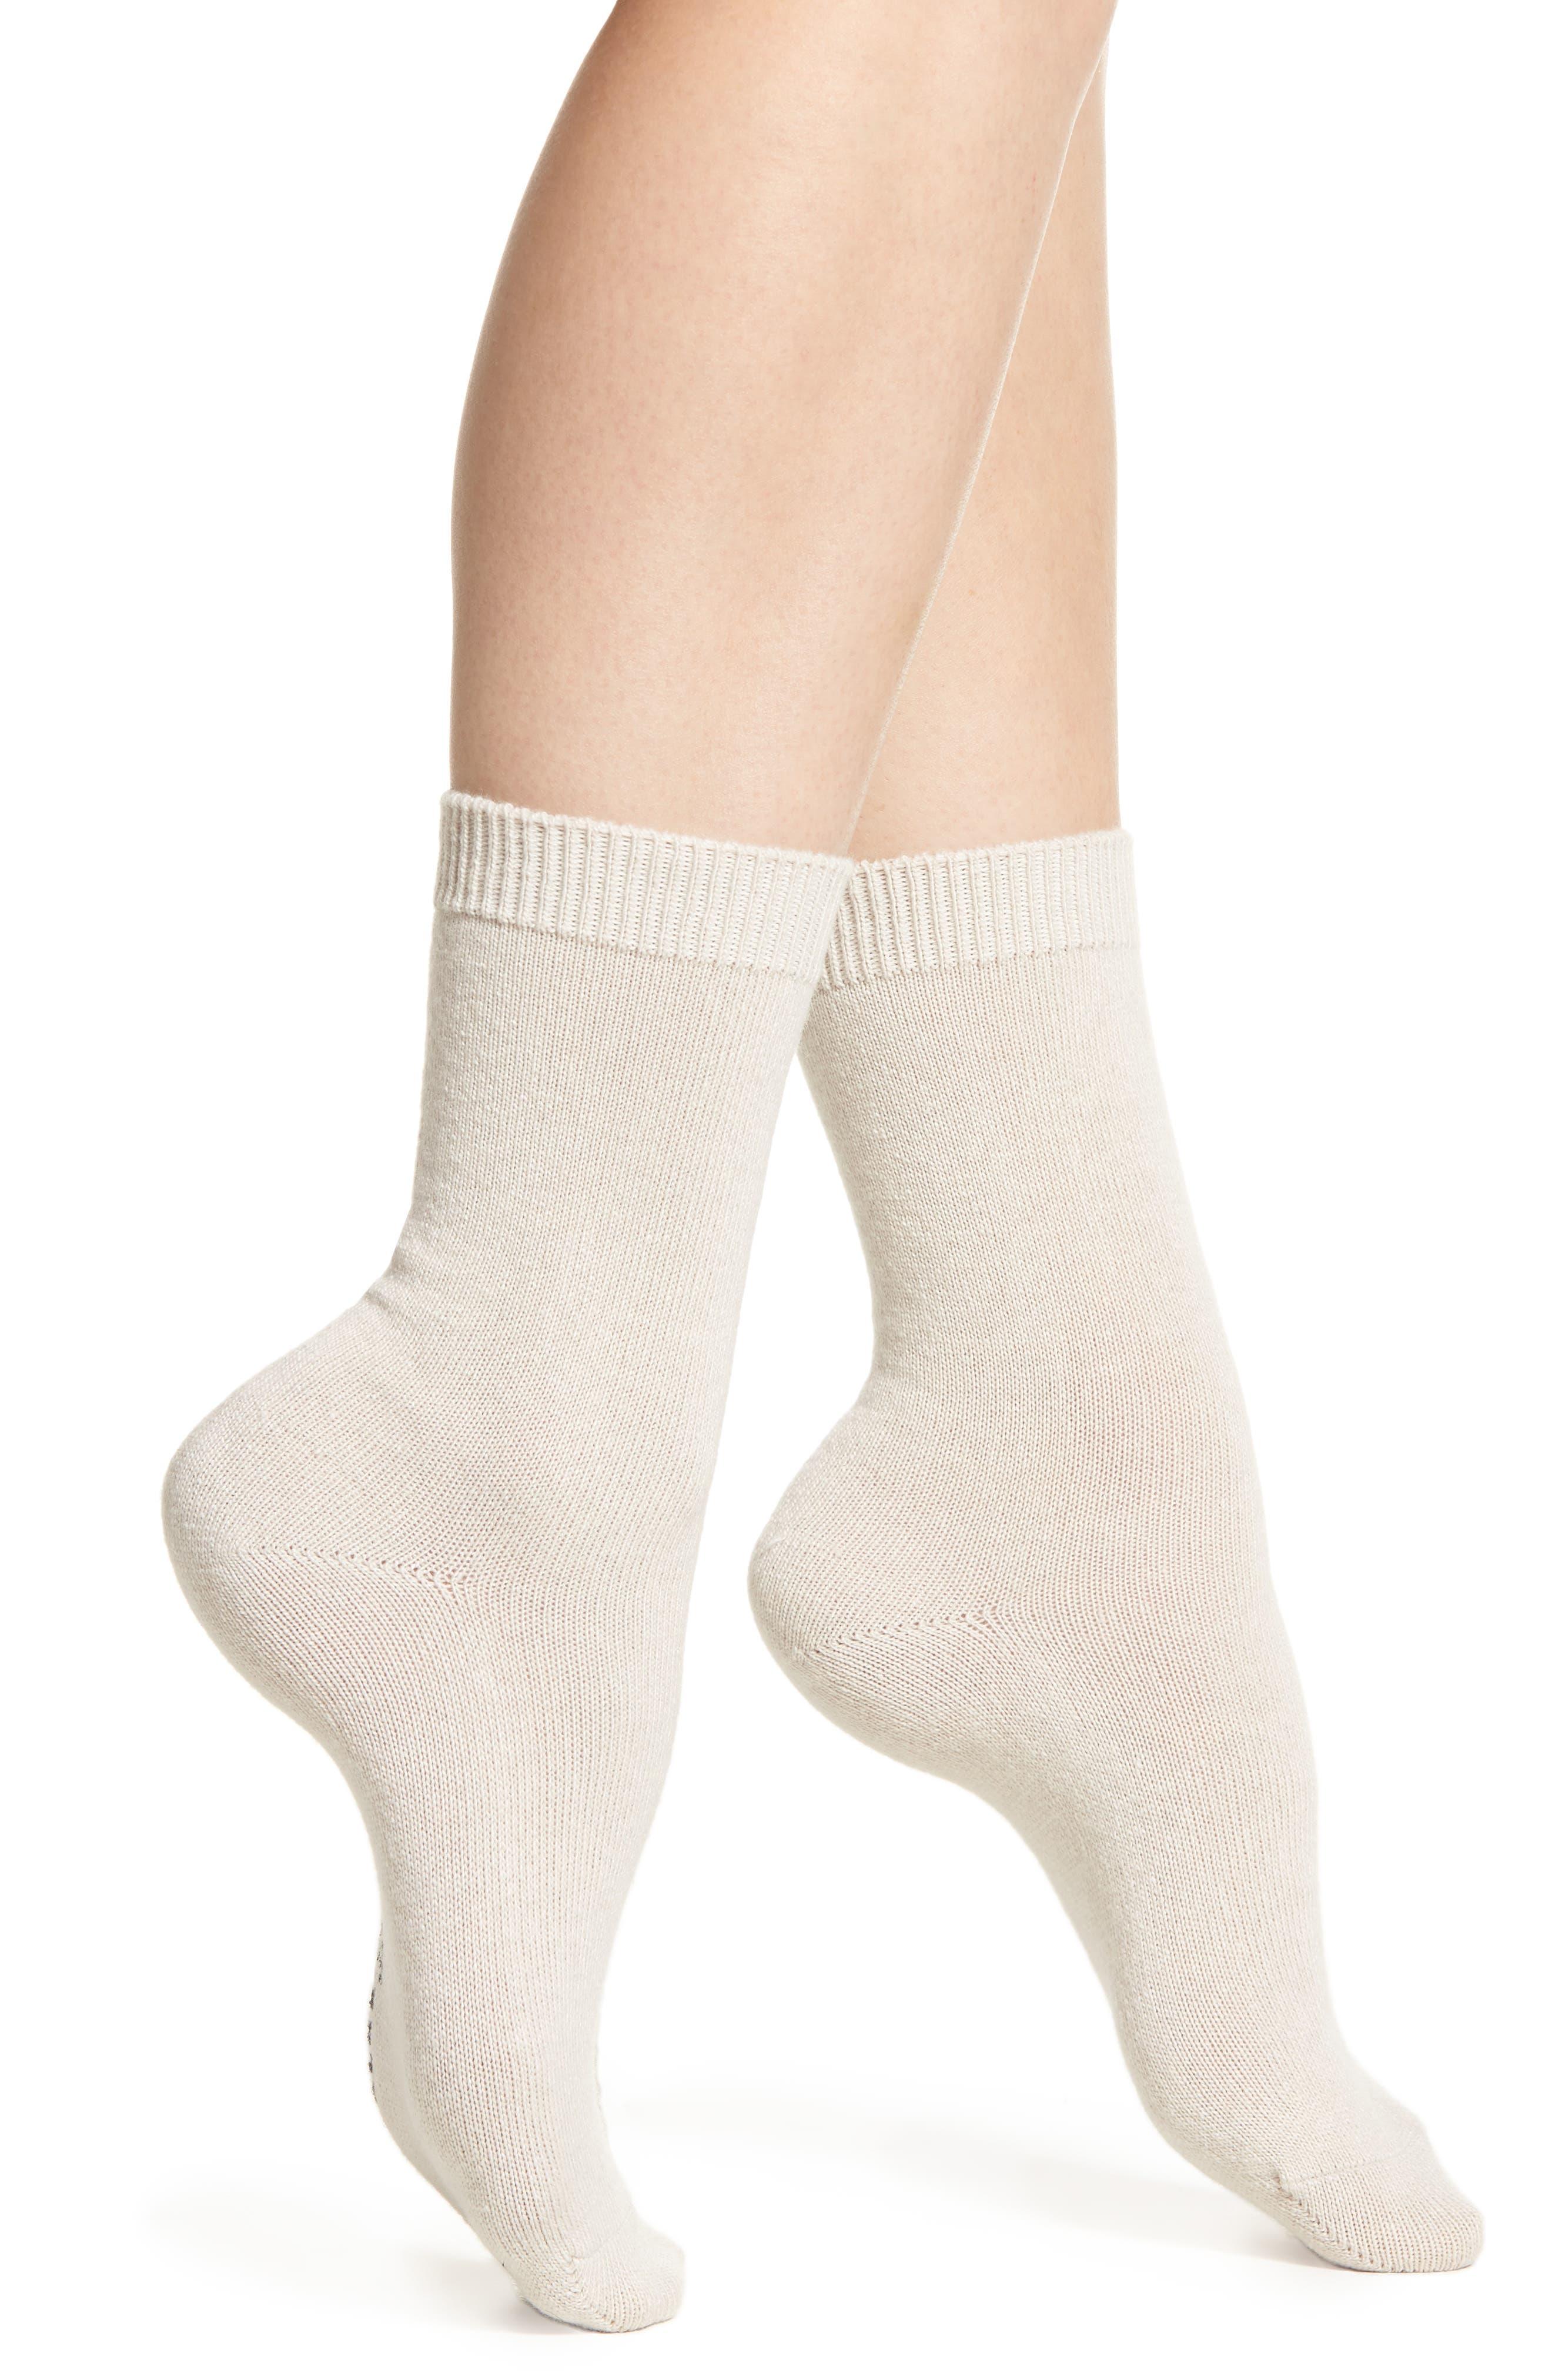 Cosy Crew Socks,                         Main,                         color,